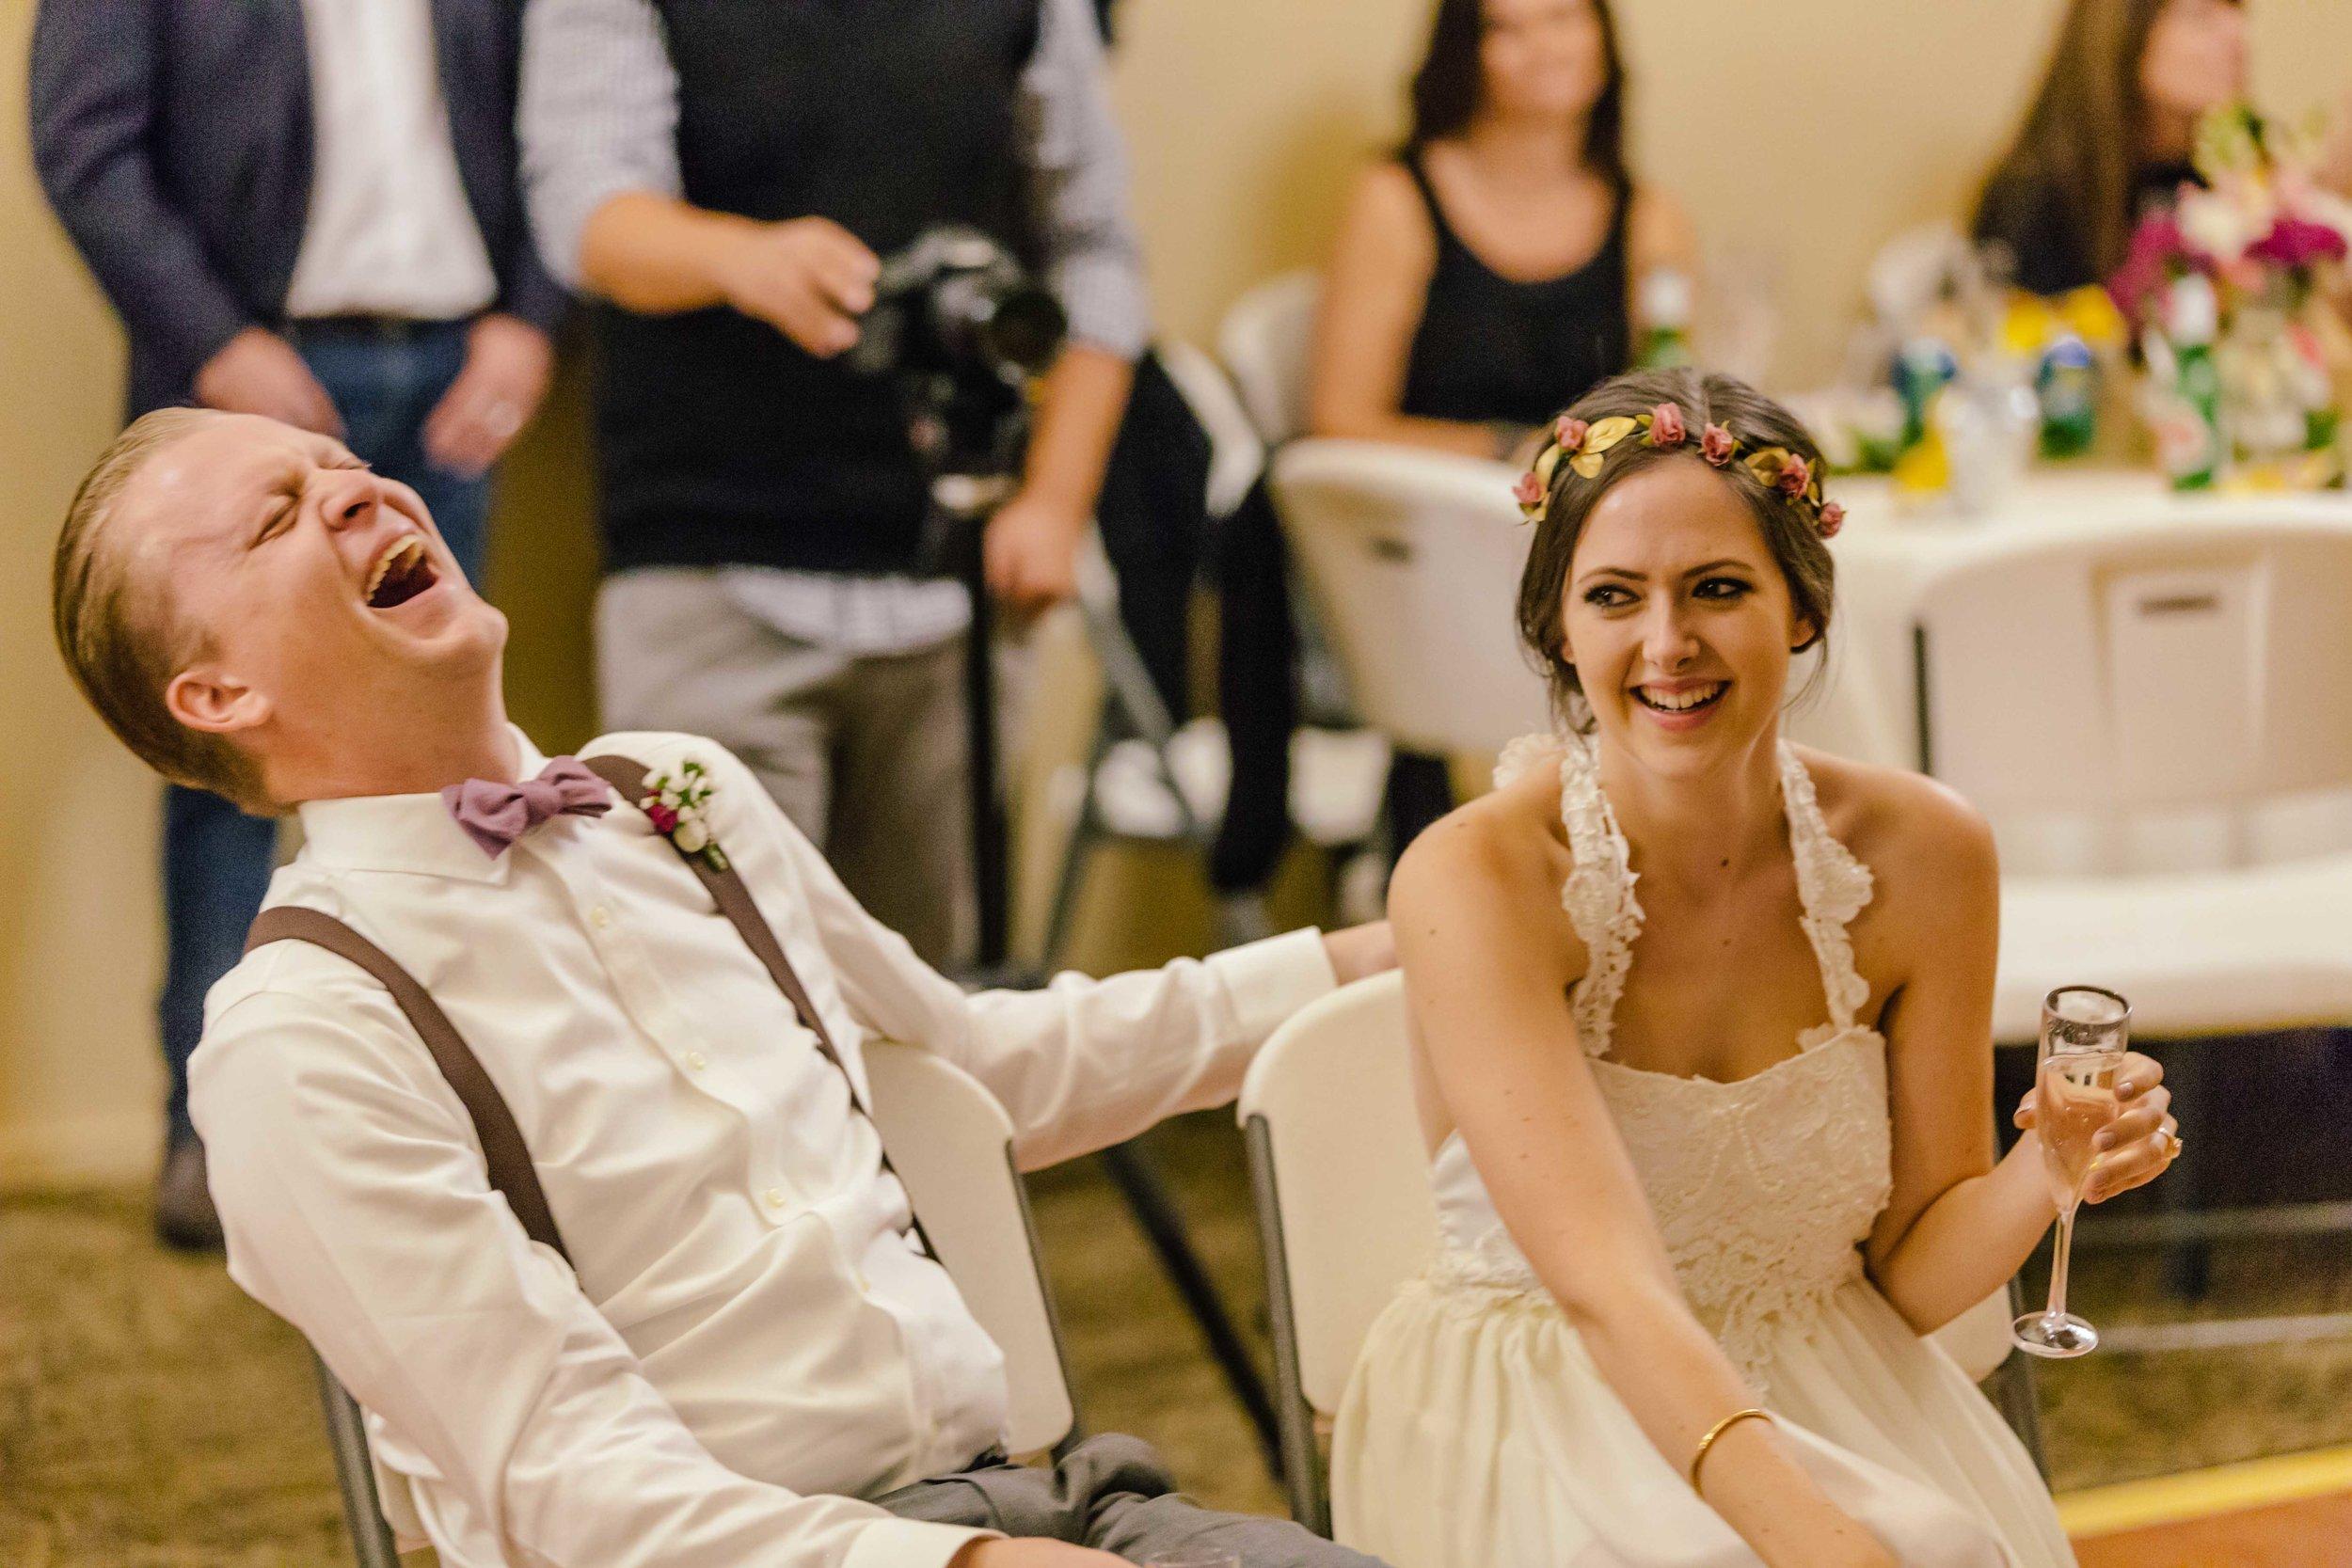 20141024-DePartee-Wedding-APavone-059-sm.jpg